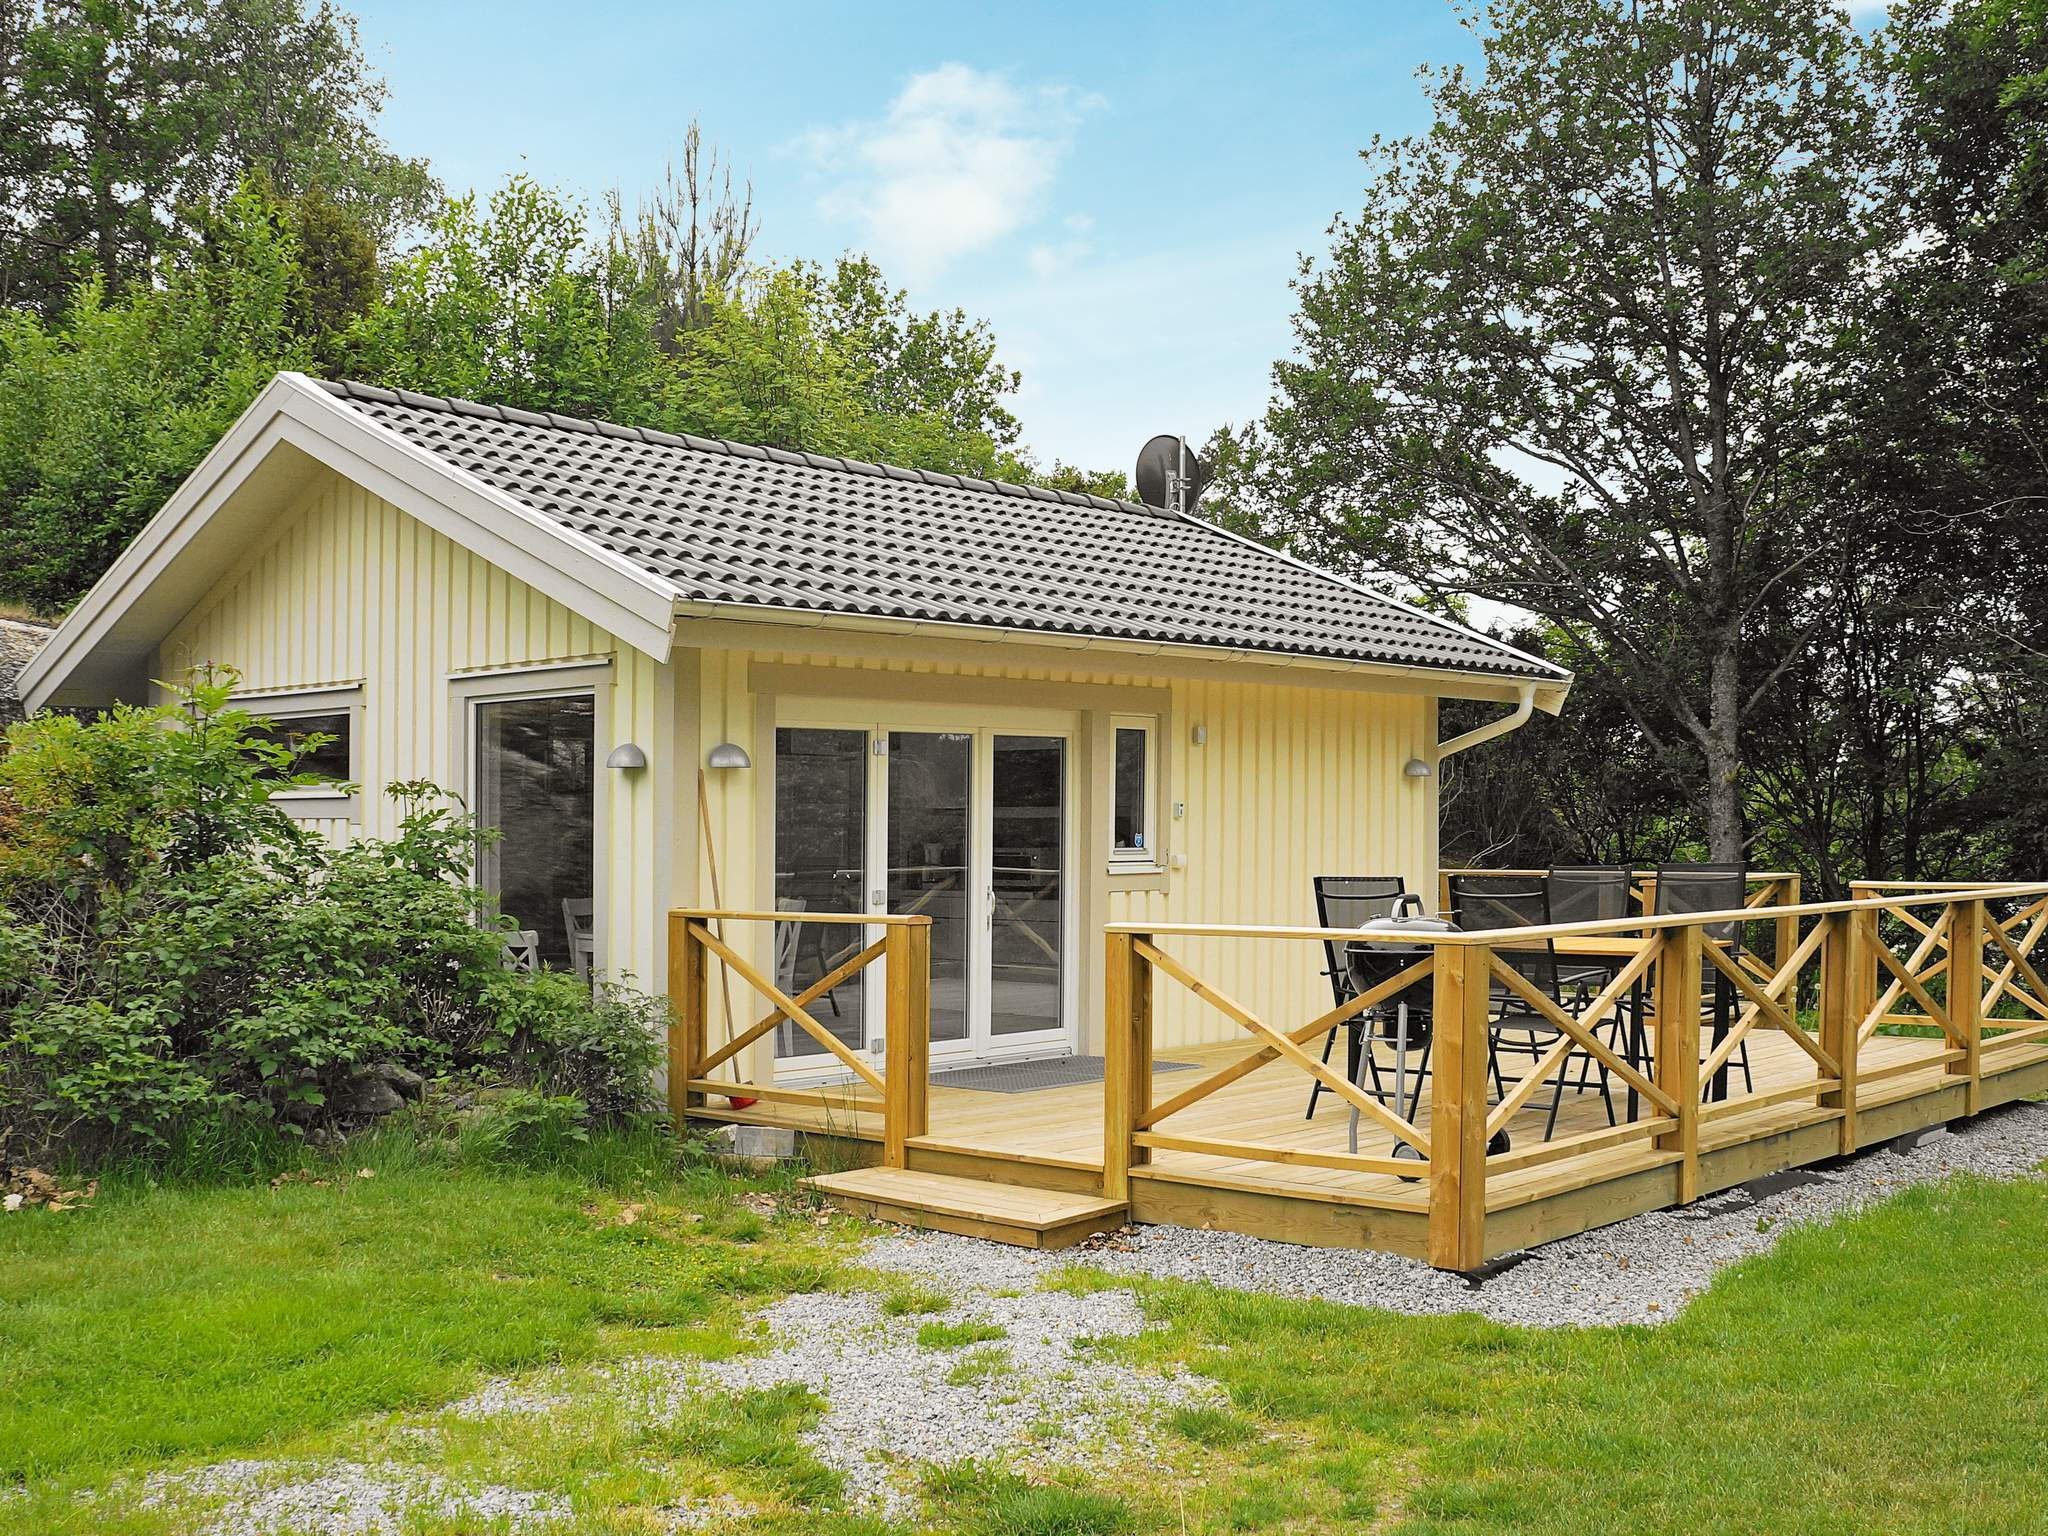 Ferienhaus Tjörn/Huseberg (672440), Kållekärr, Tjörn, Westschweden, Schweden, Bild 1